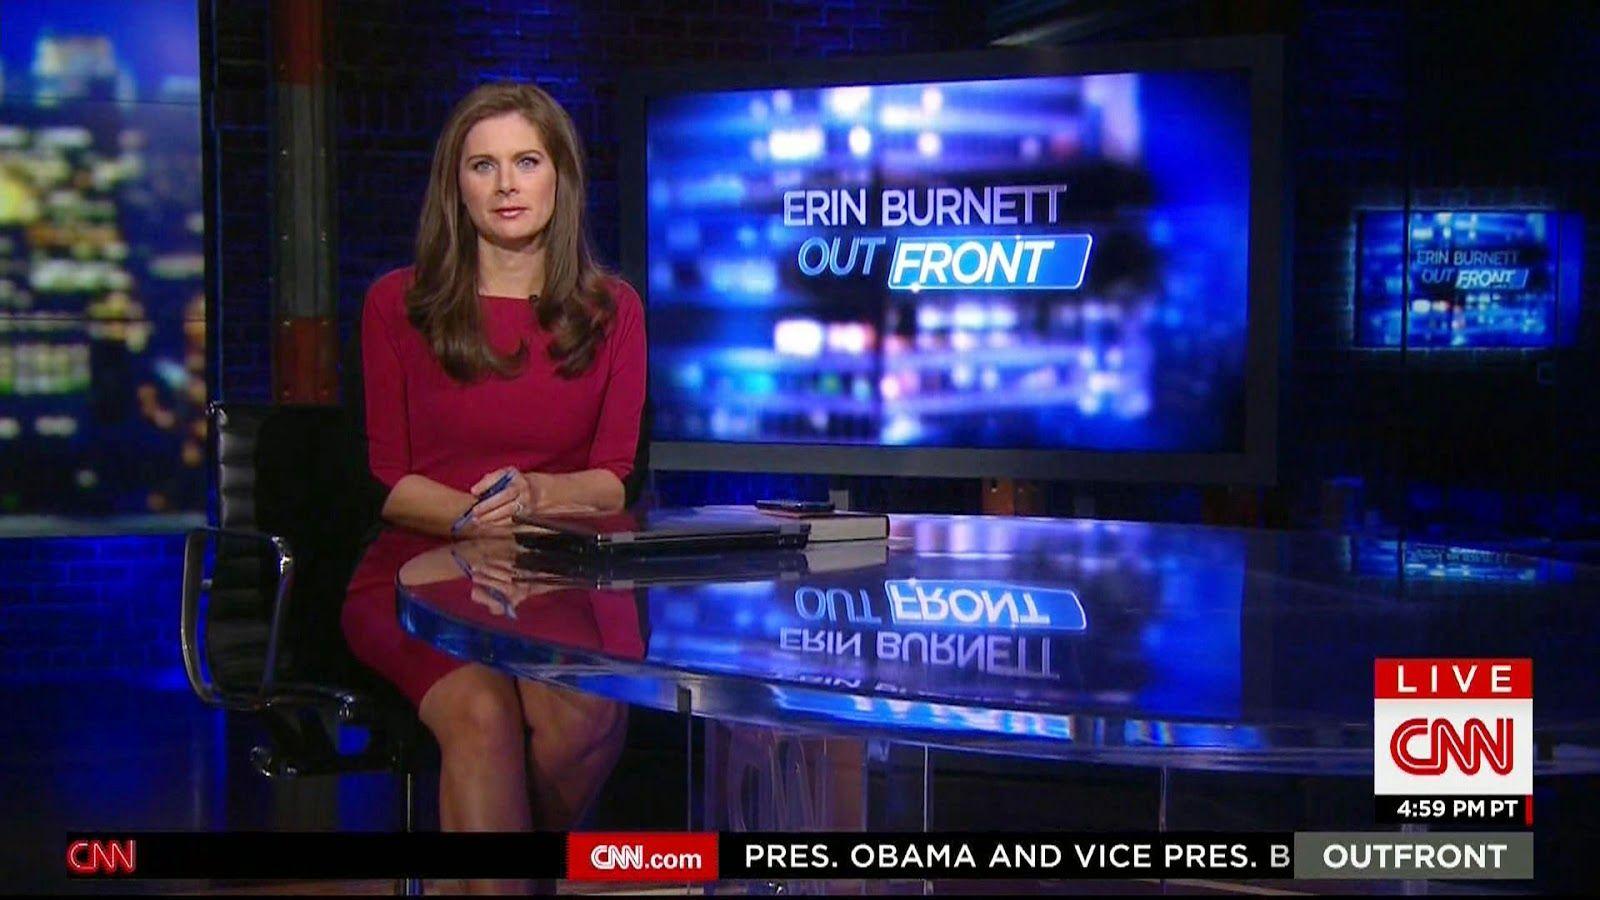 Erin burnett shorts — img 8